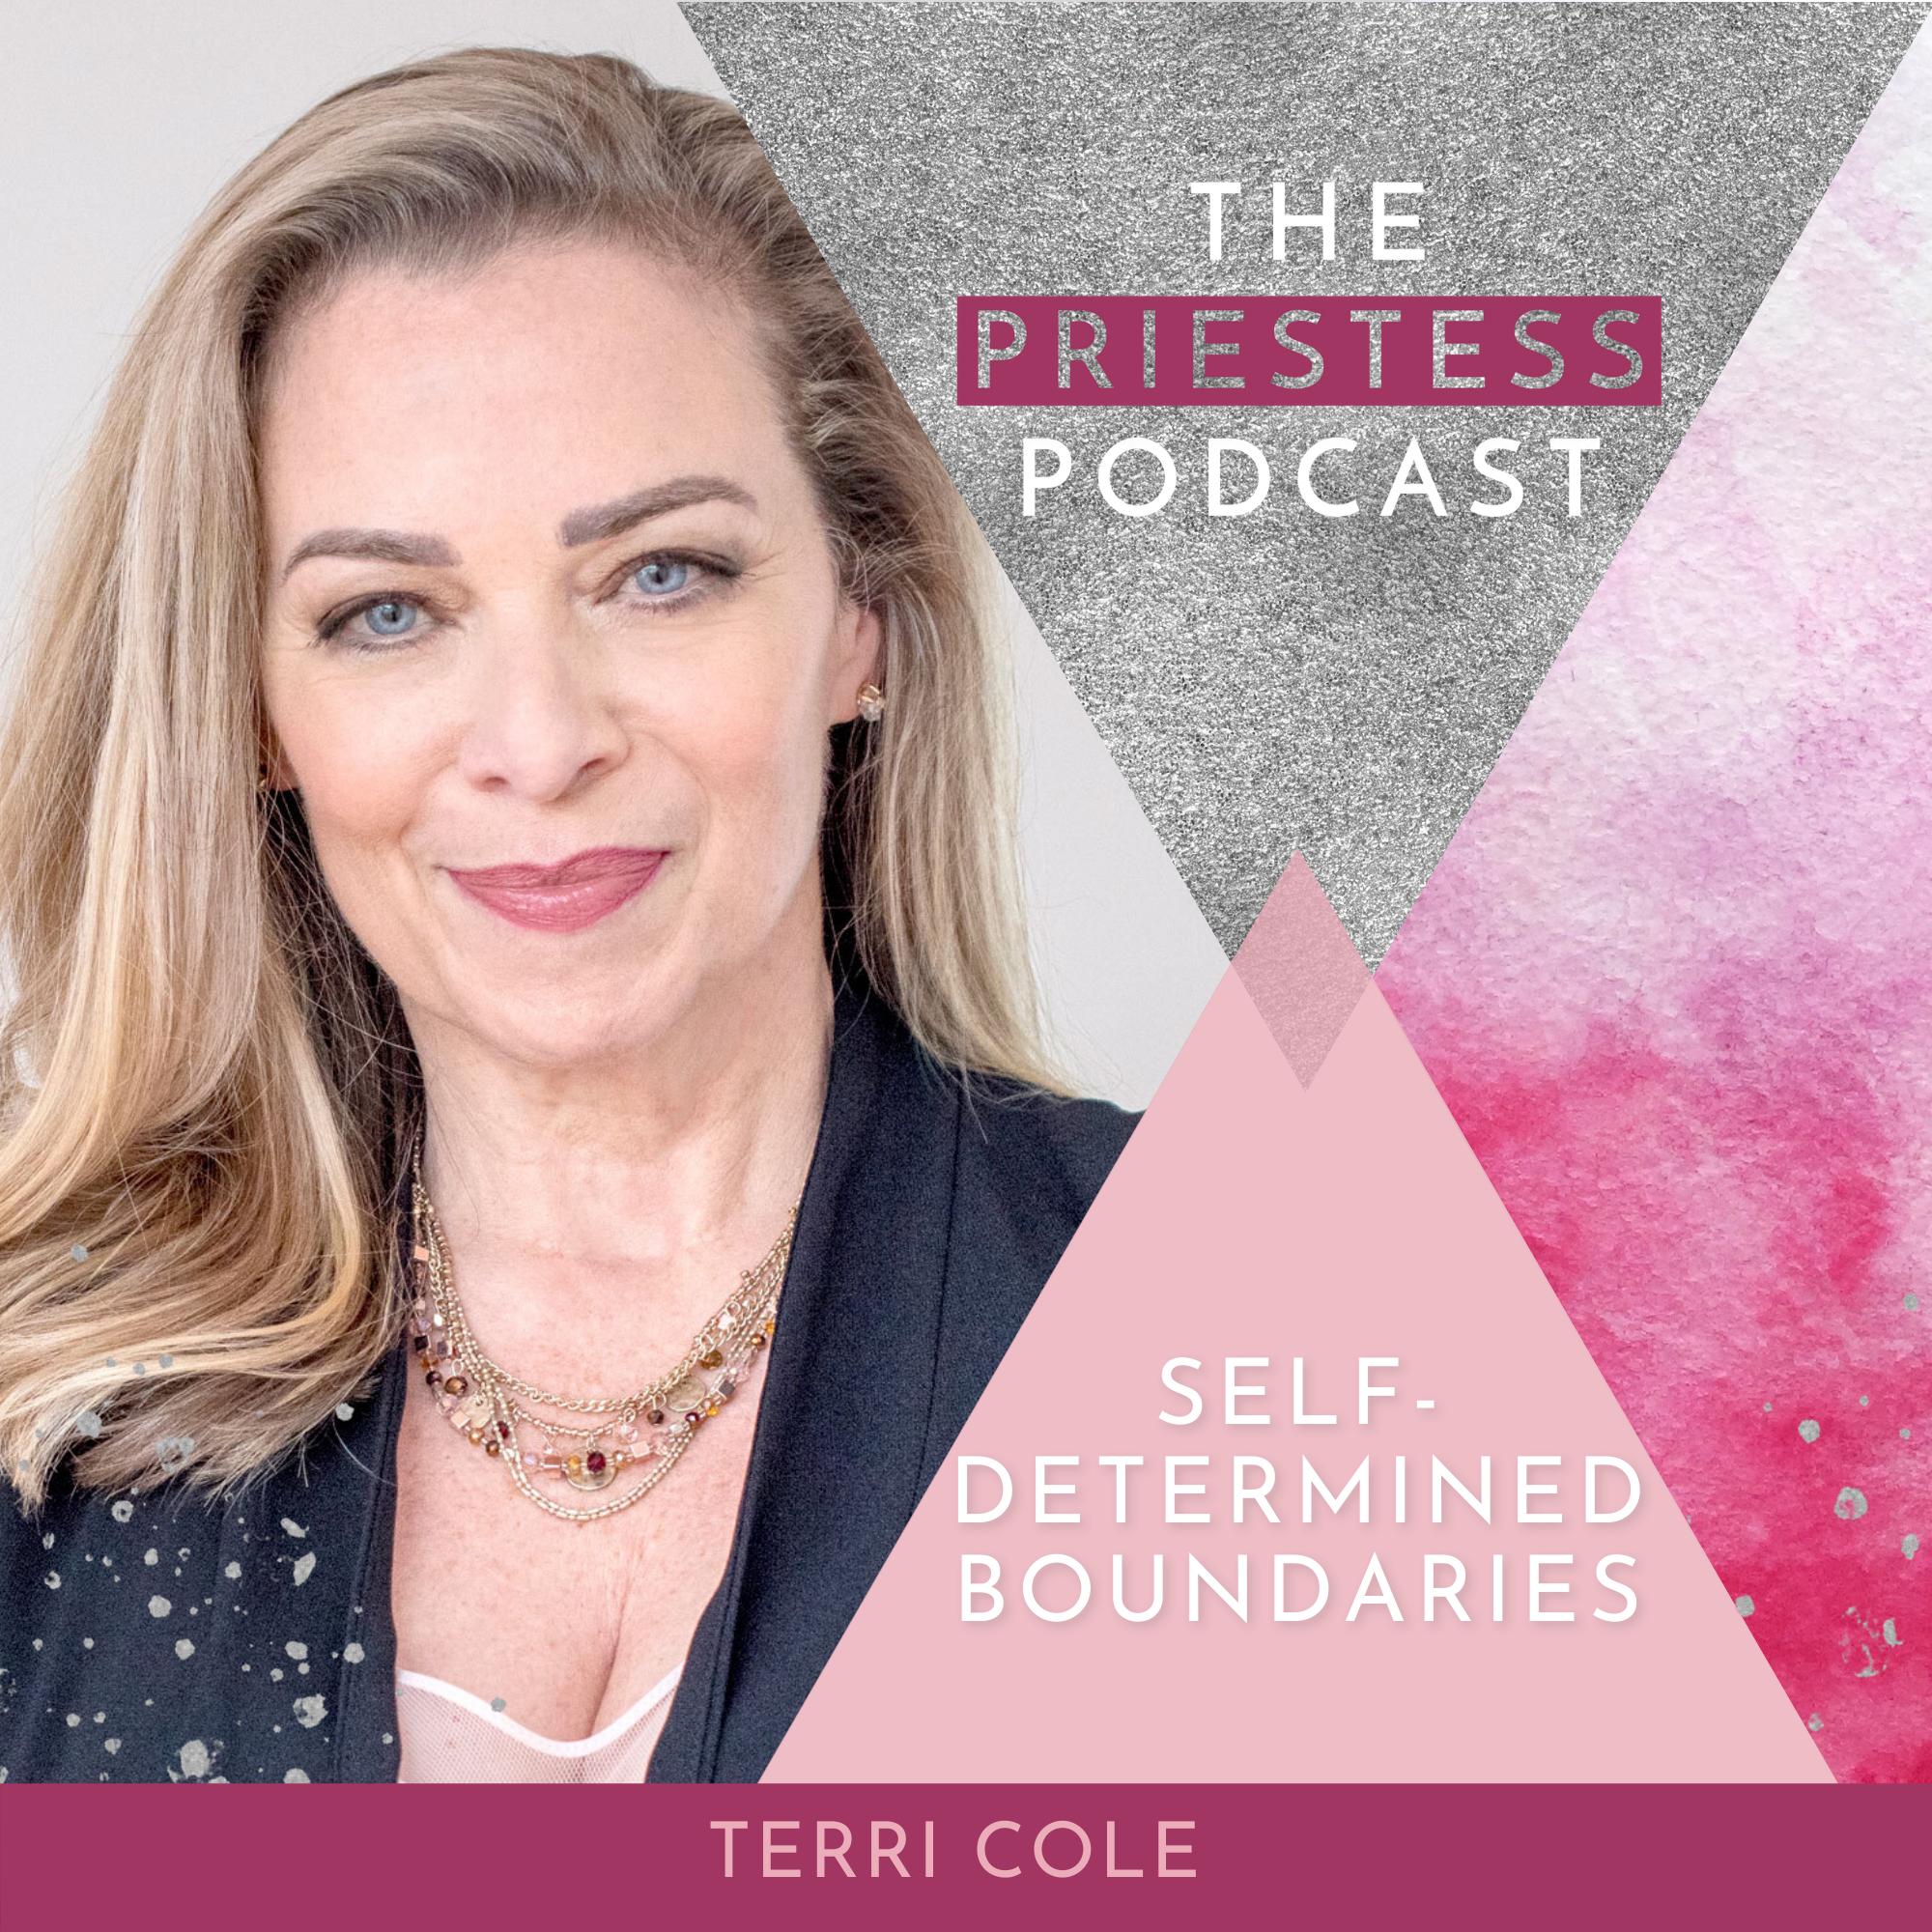 Terri Cole on Self-Determined Boundaries